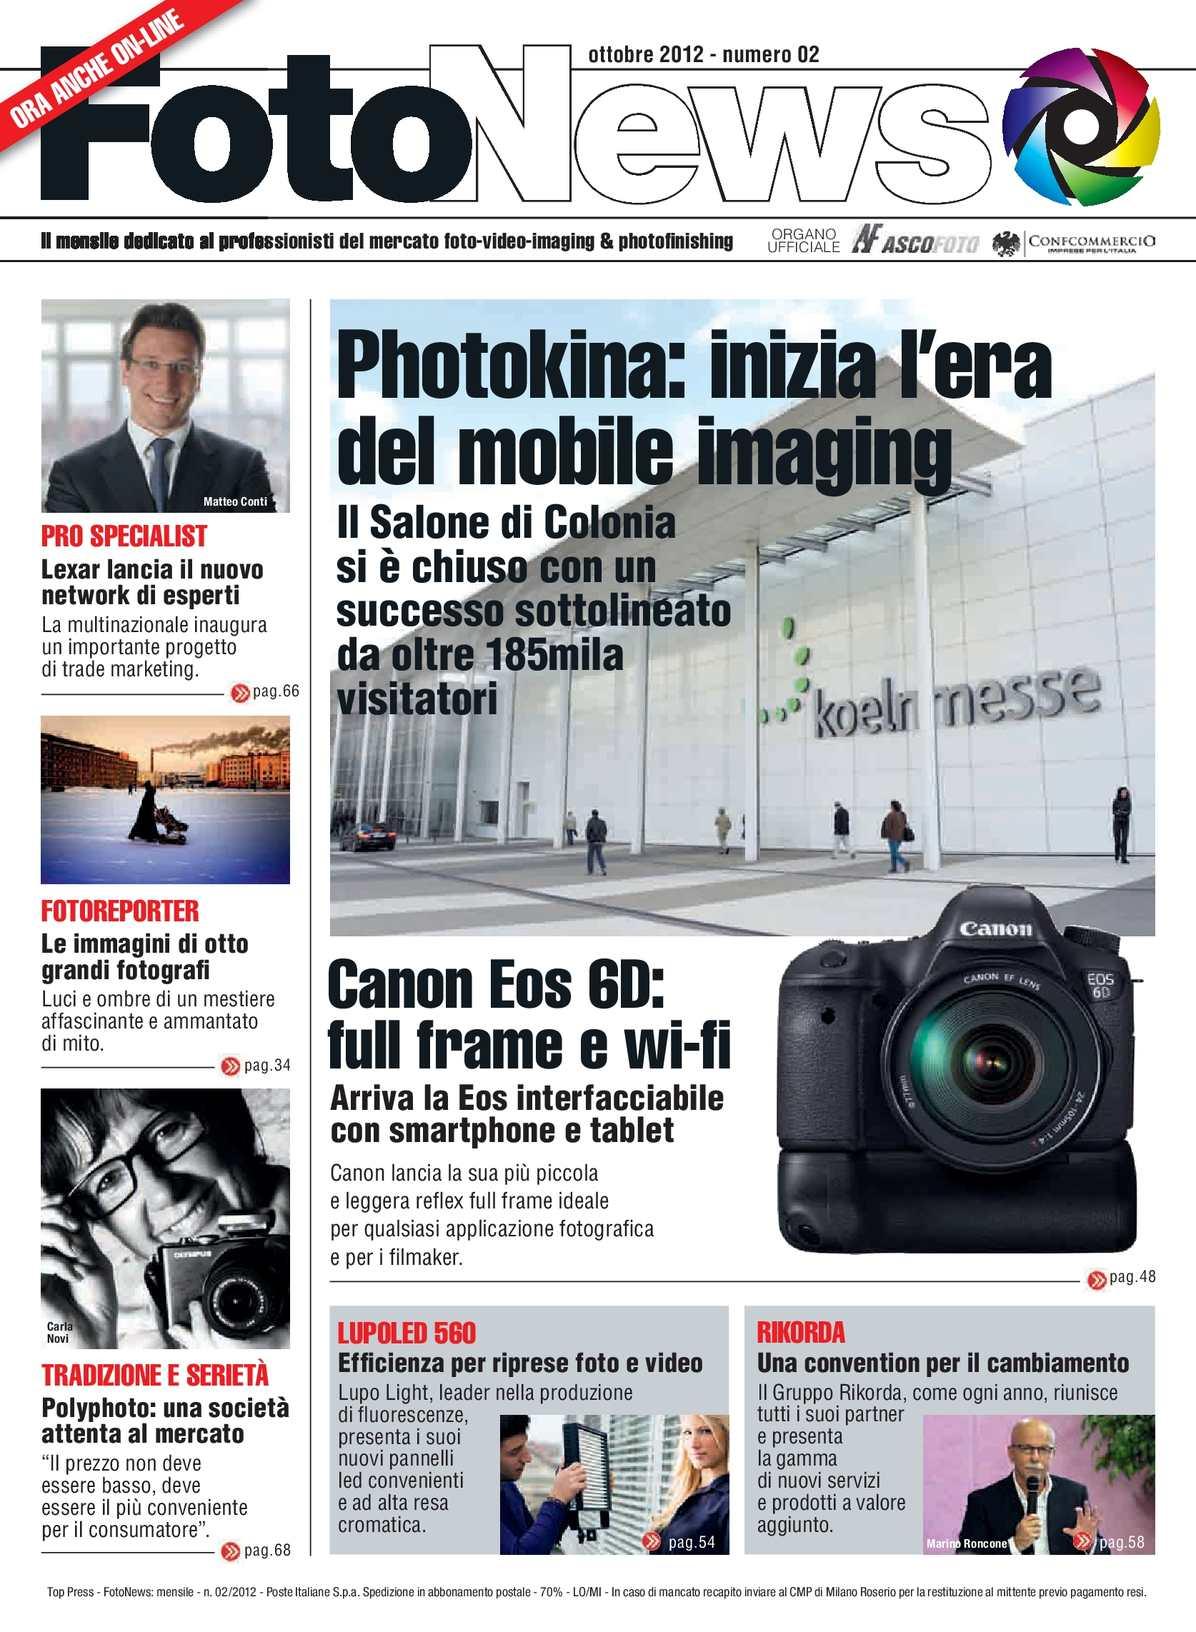 FotoNews 02 ottobre 2012